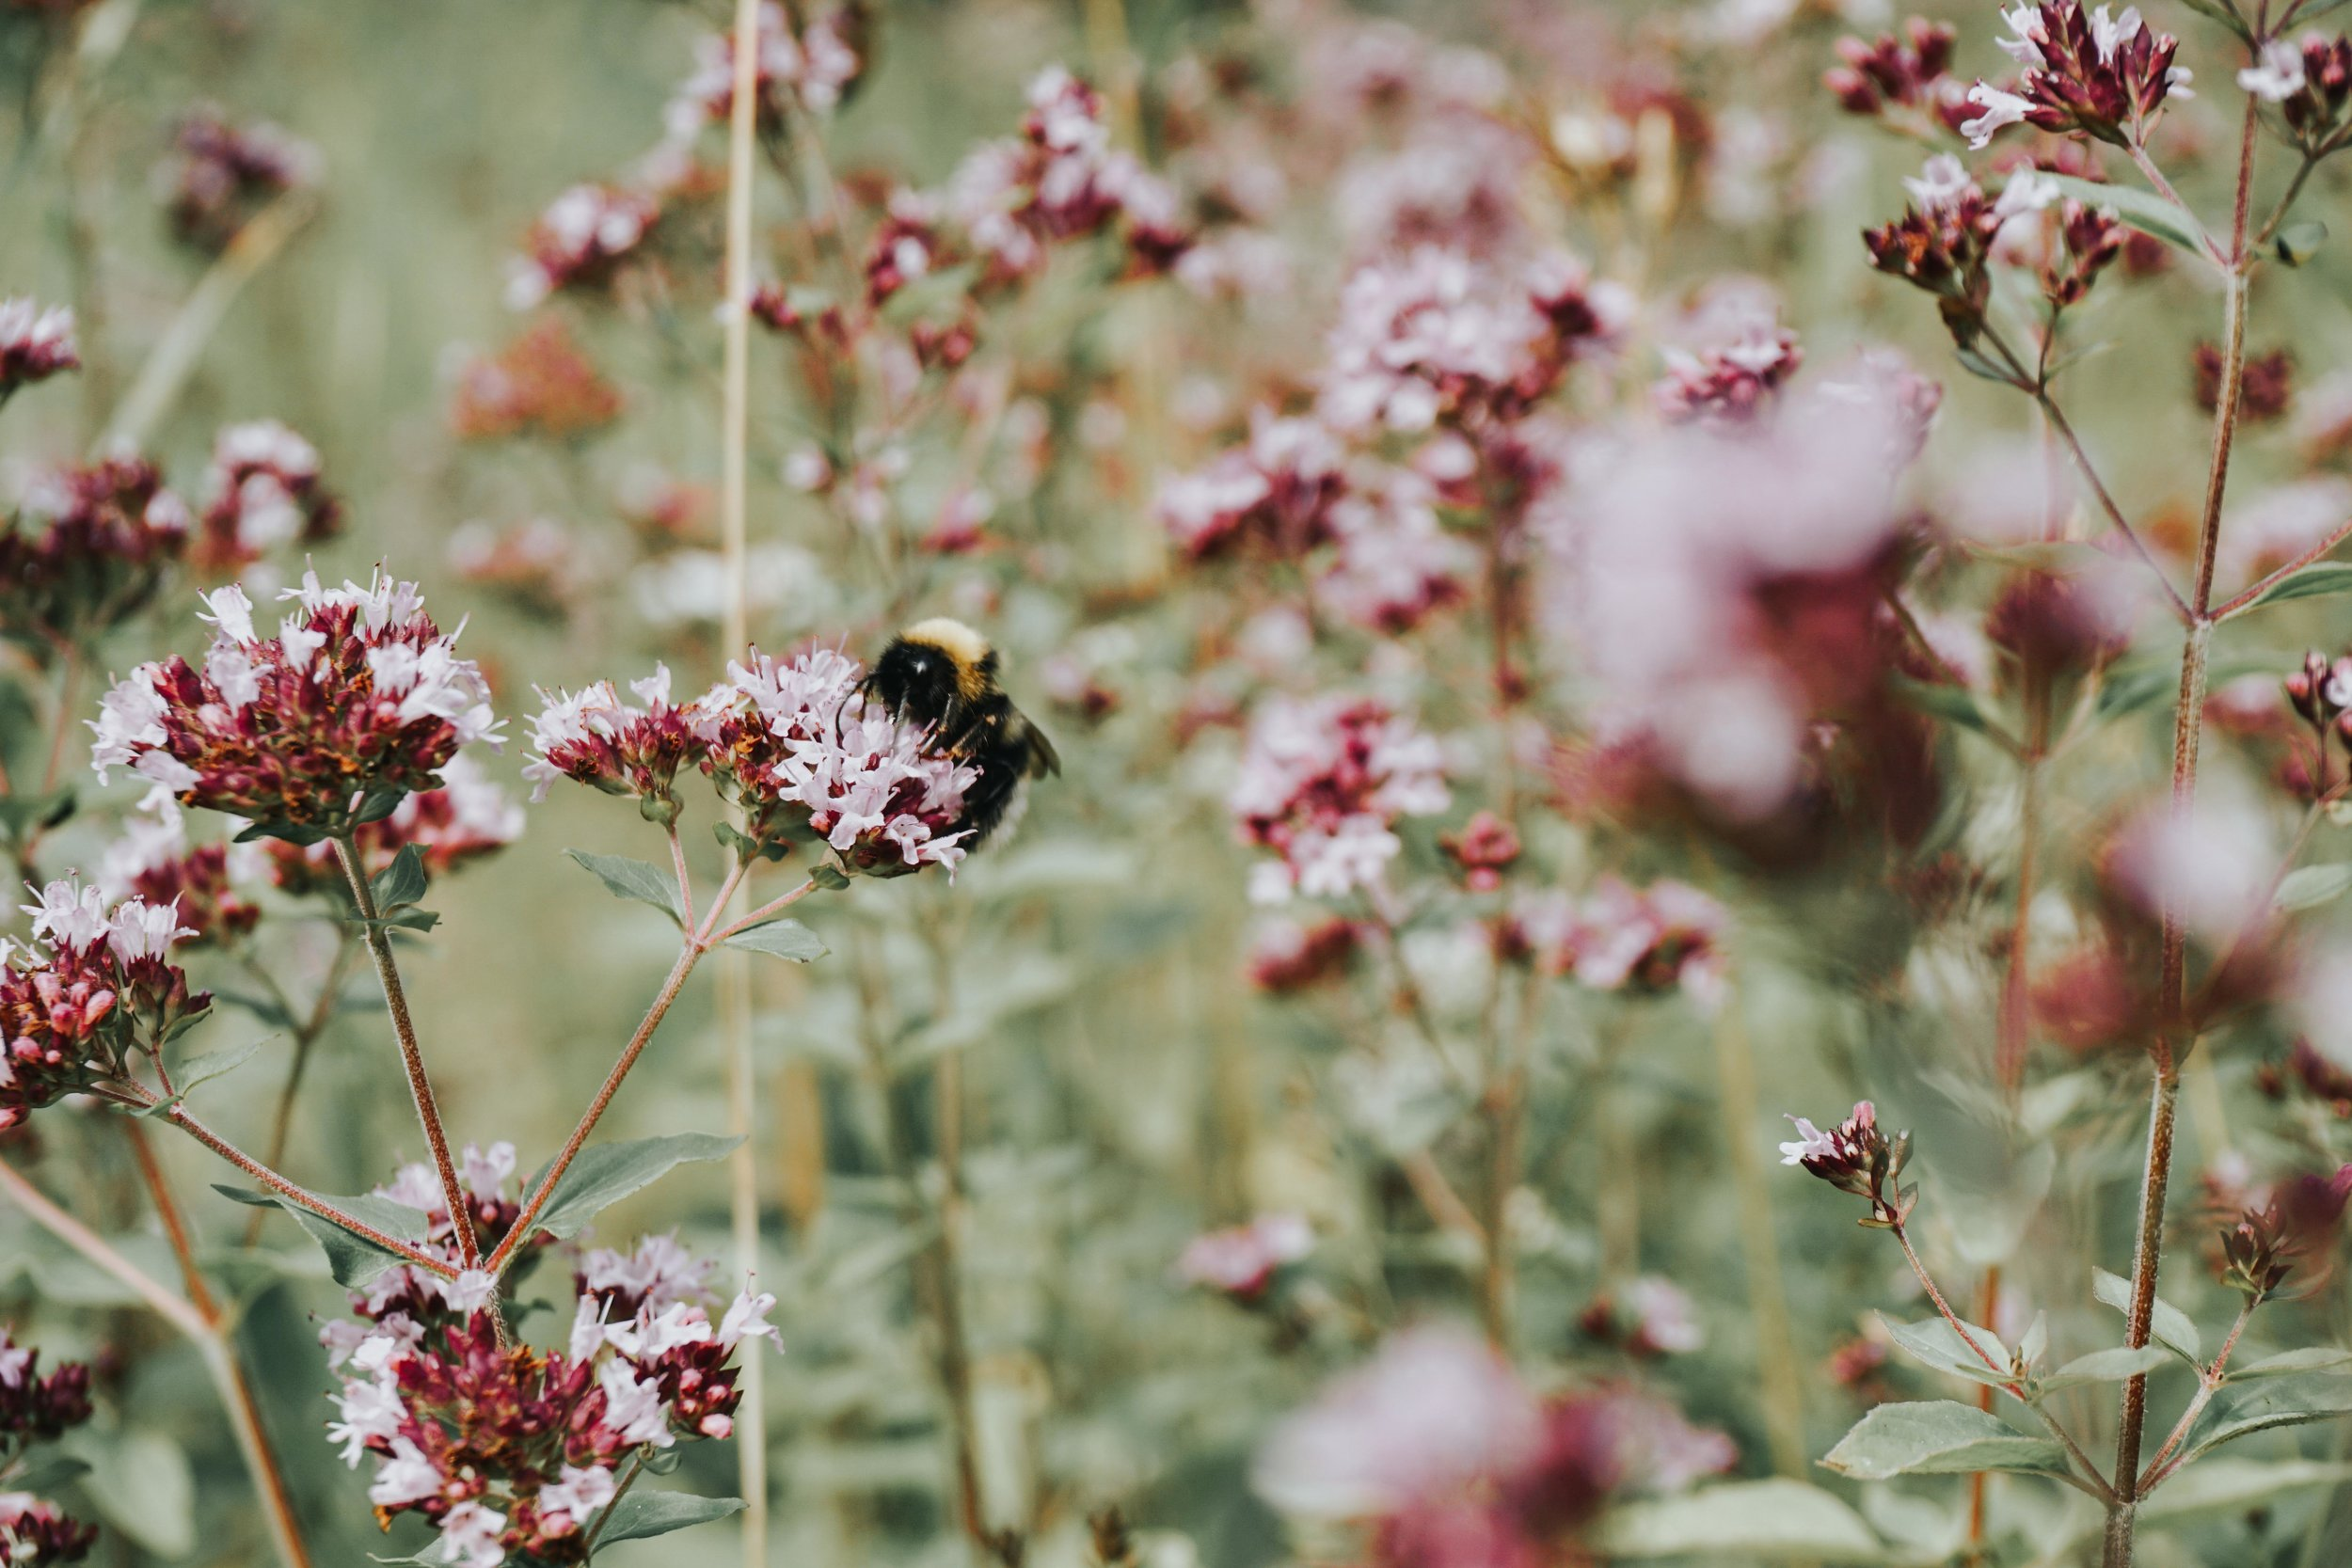 Nordic Honey_Mesilane nektarit korjamas_Mahemesindus_Mesilased